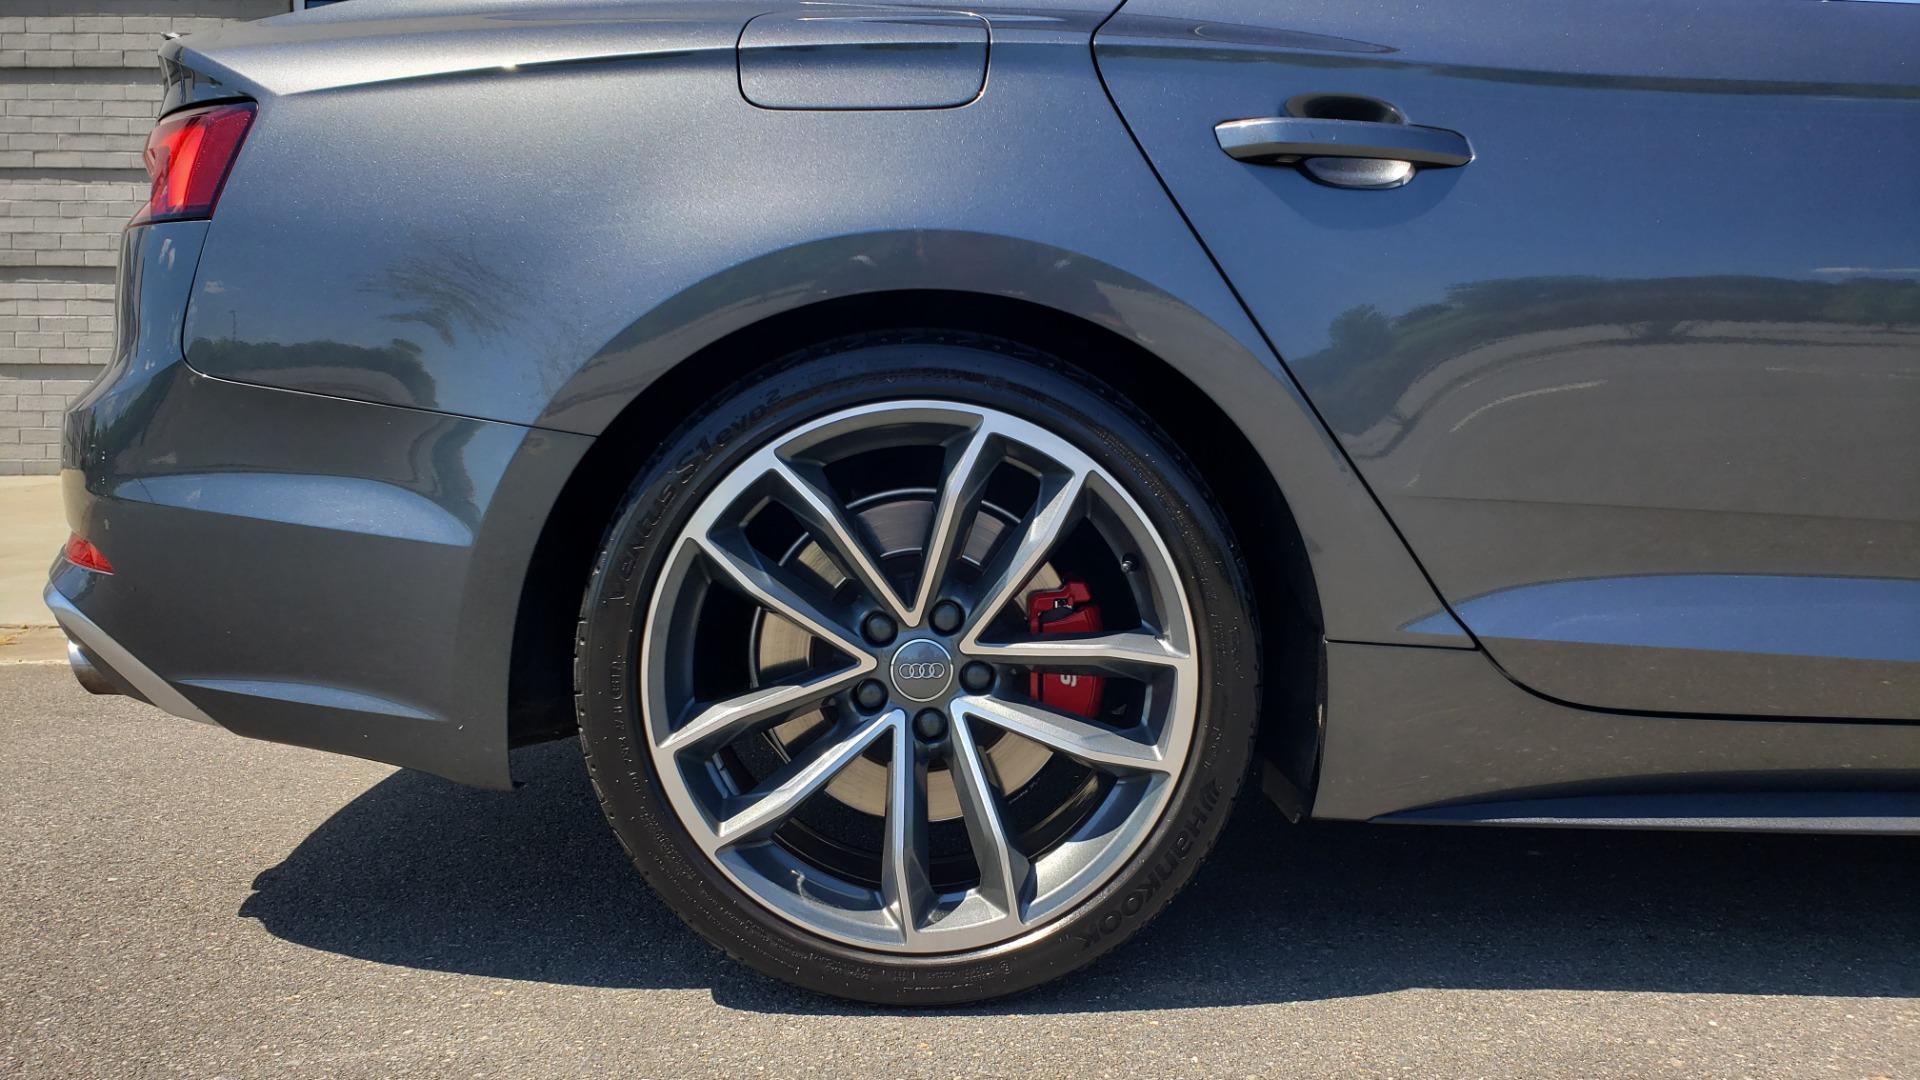 Used 2018 Audi S5 SPORTBACK PRESTIGE S-SPORT / NAV / SUNROOF / HUD / B&O SND / REARVIEW for sale $48,995 at Formula Imports in Charlotte NC 28227 74